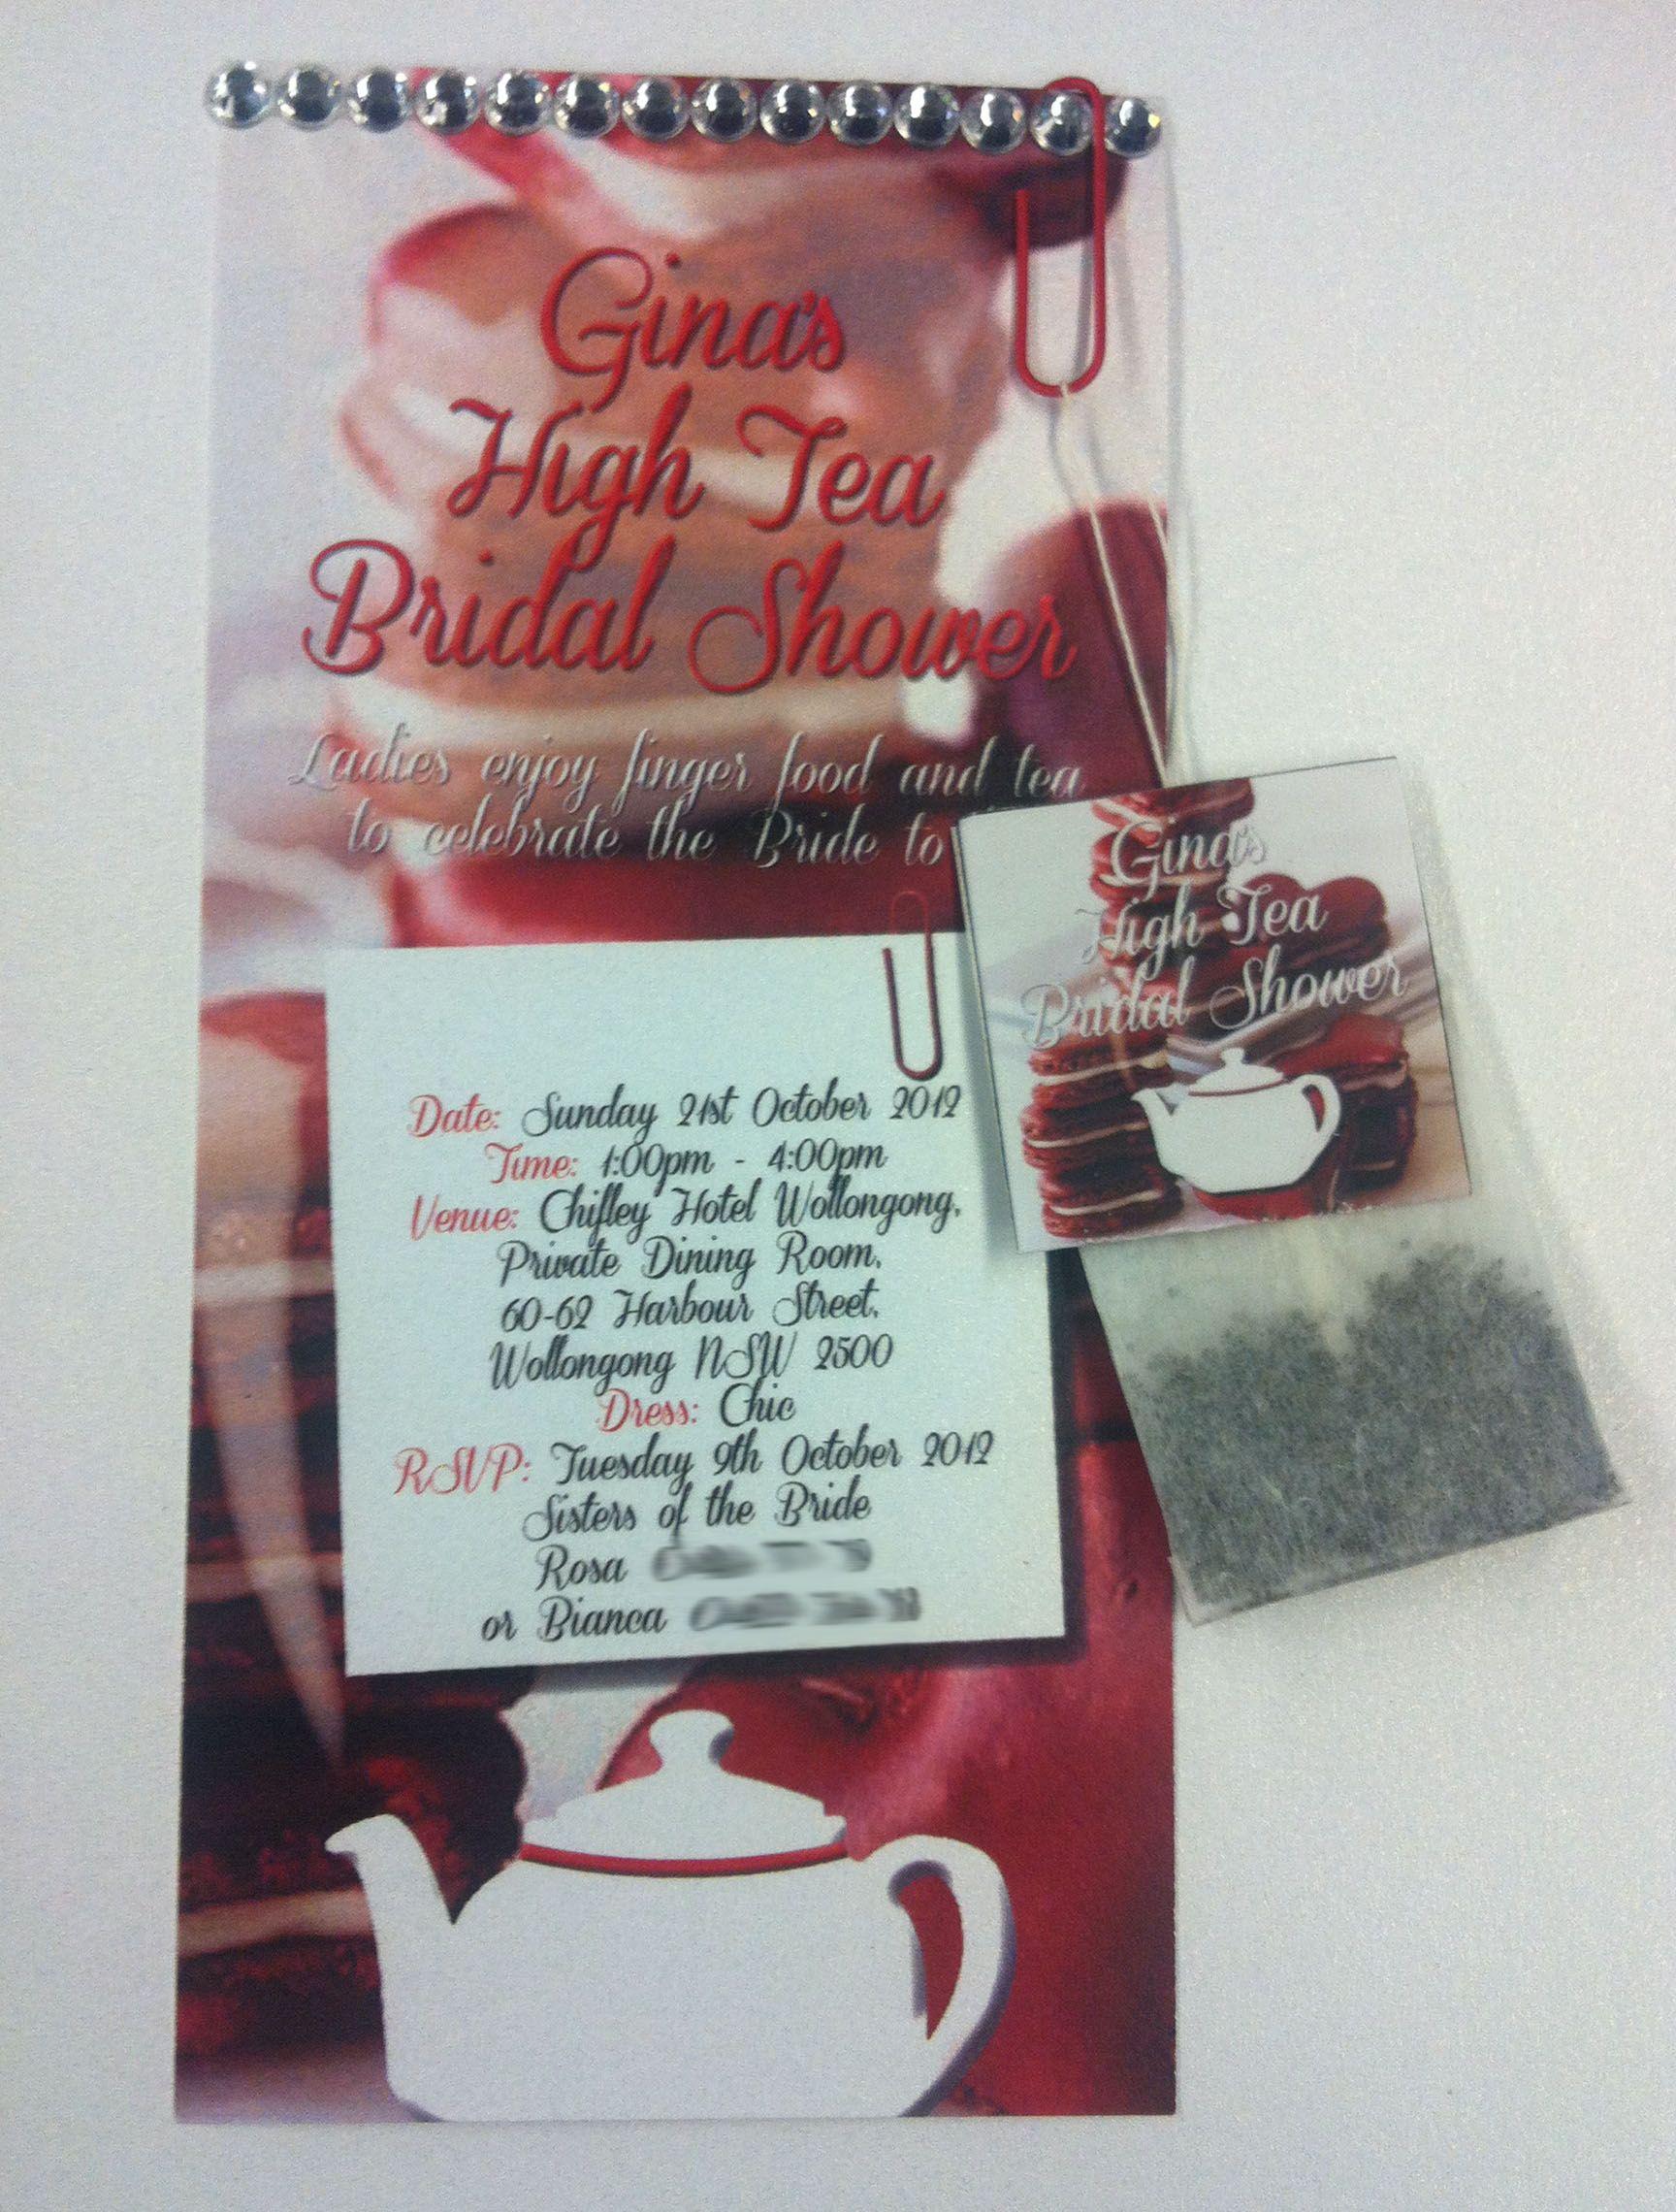 Unique bridal showerkitchen tea invitations to suit your theme by invitation design stopboris Gallery